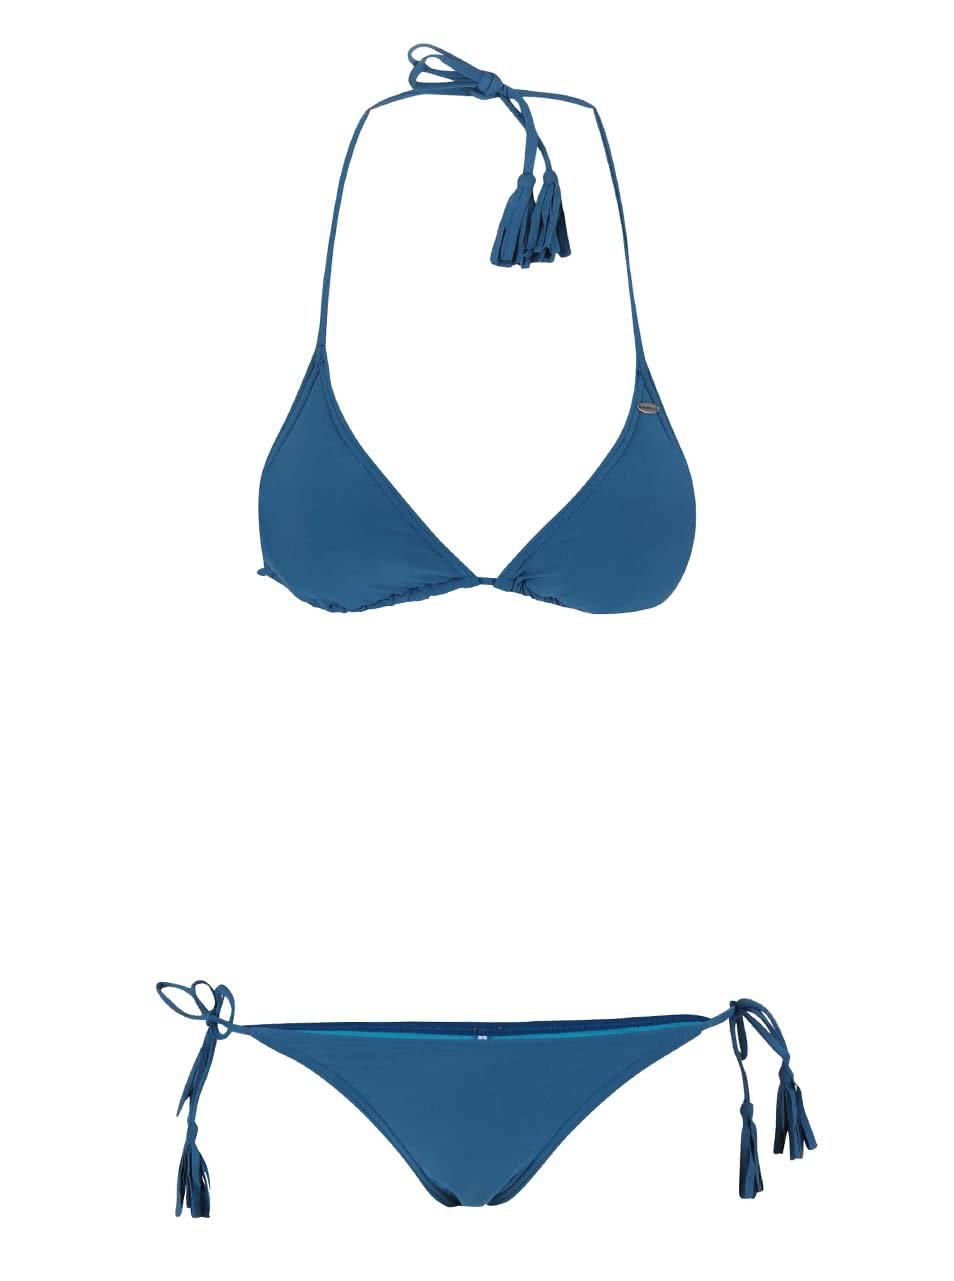 7481f72ed9 Modré plavky O Neill Solid Triangle ...